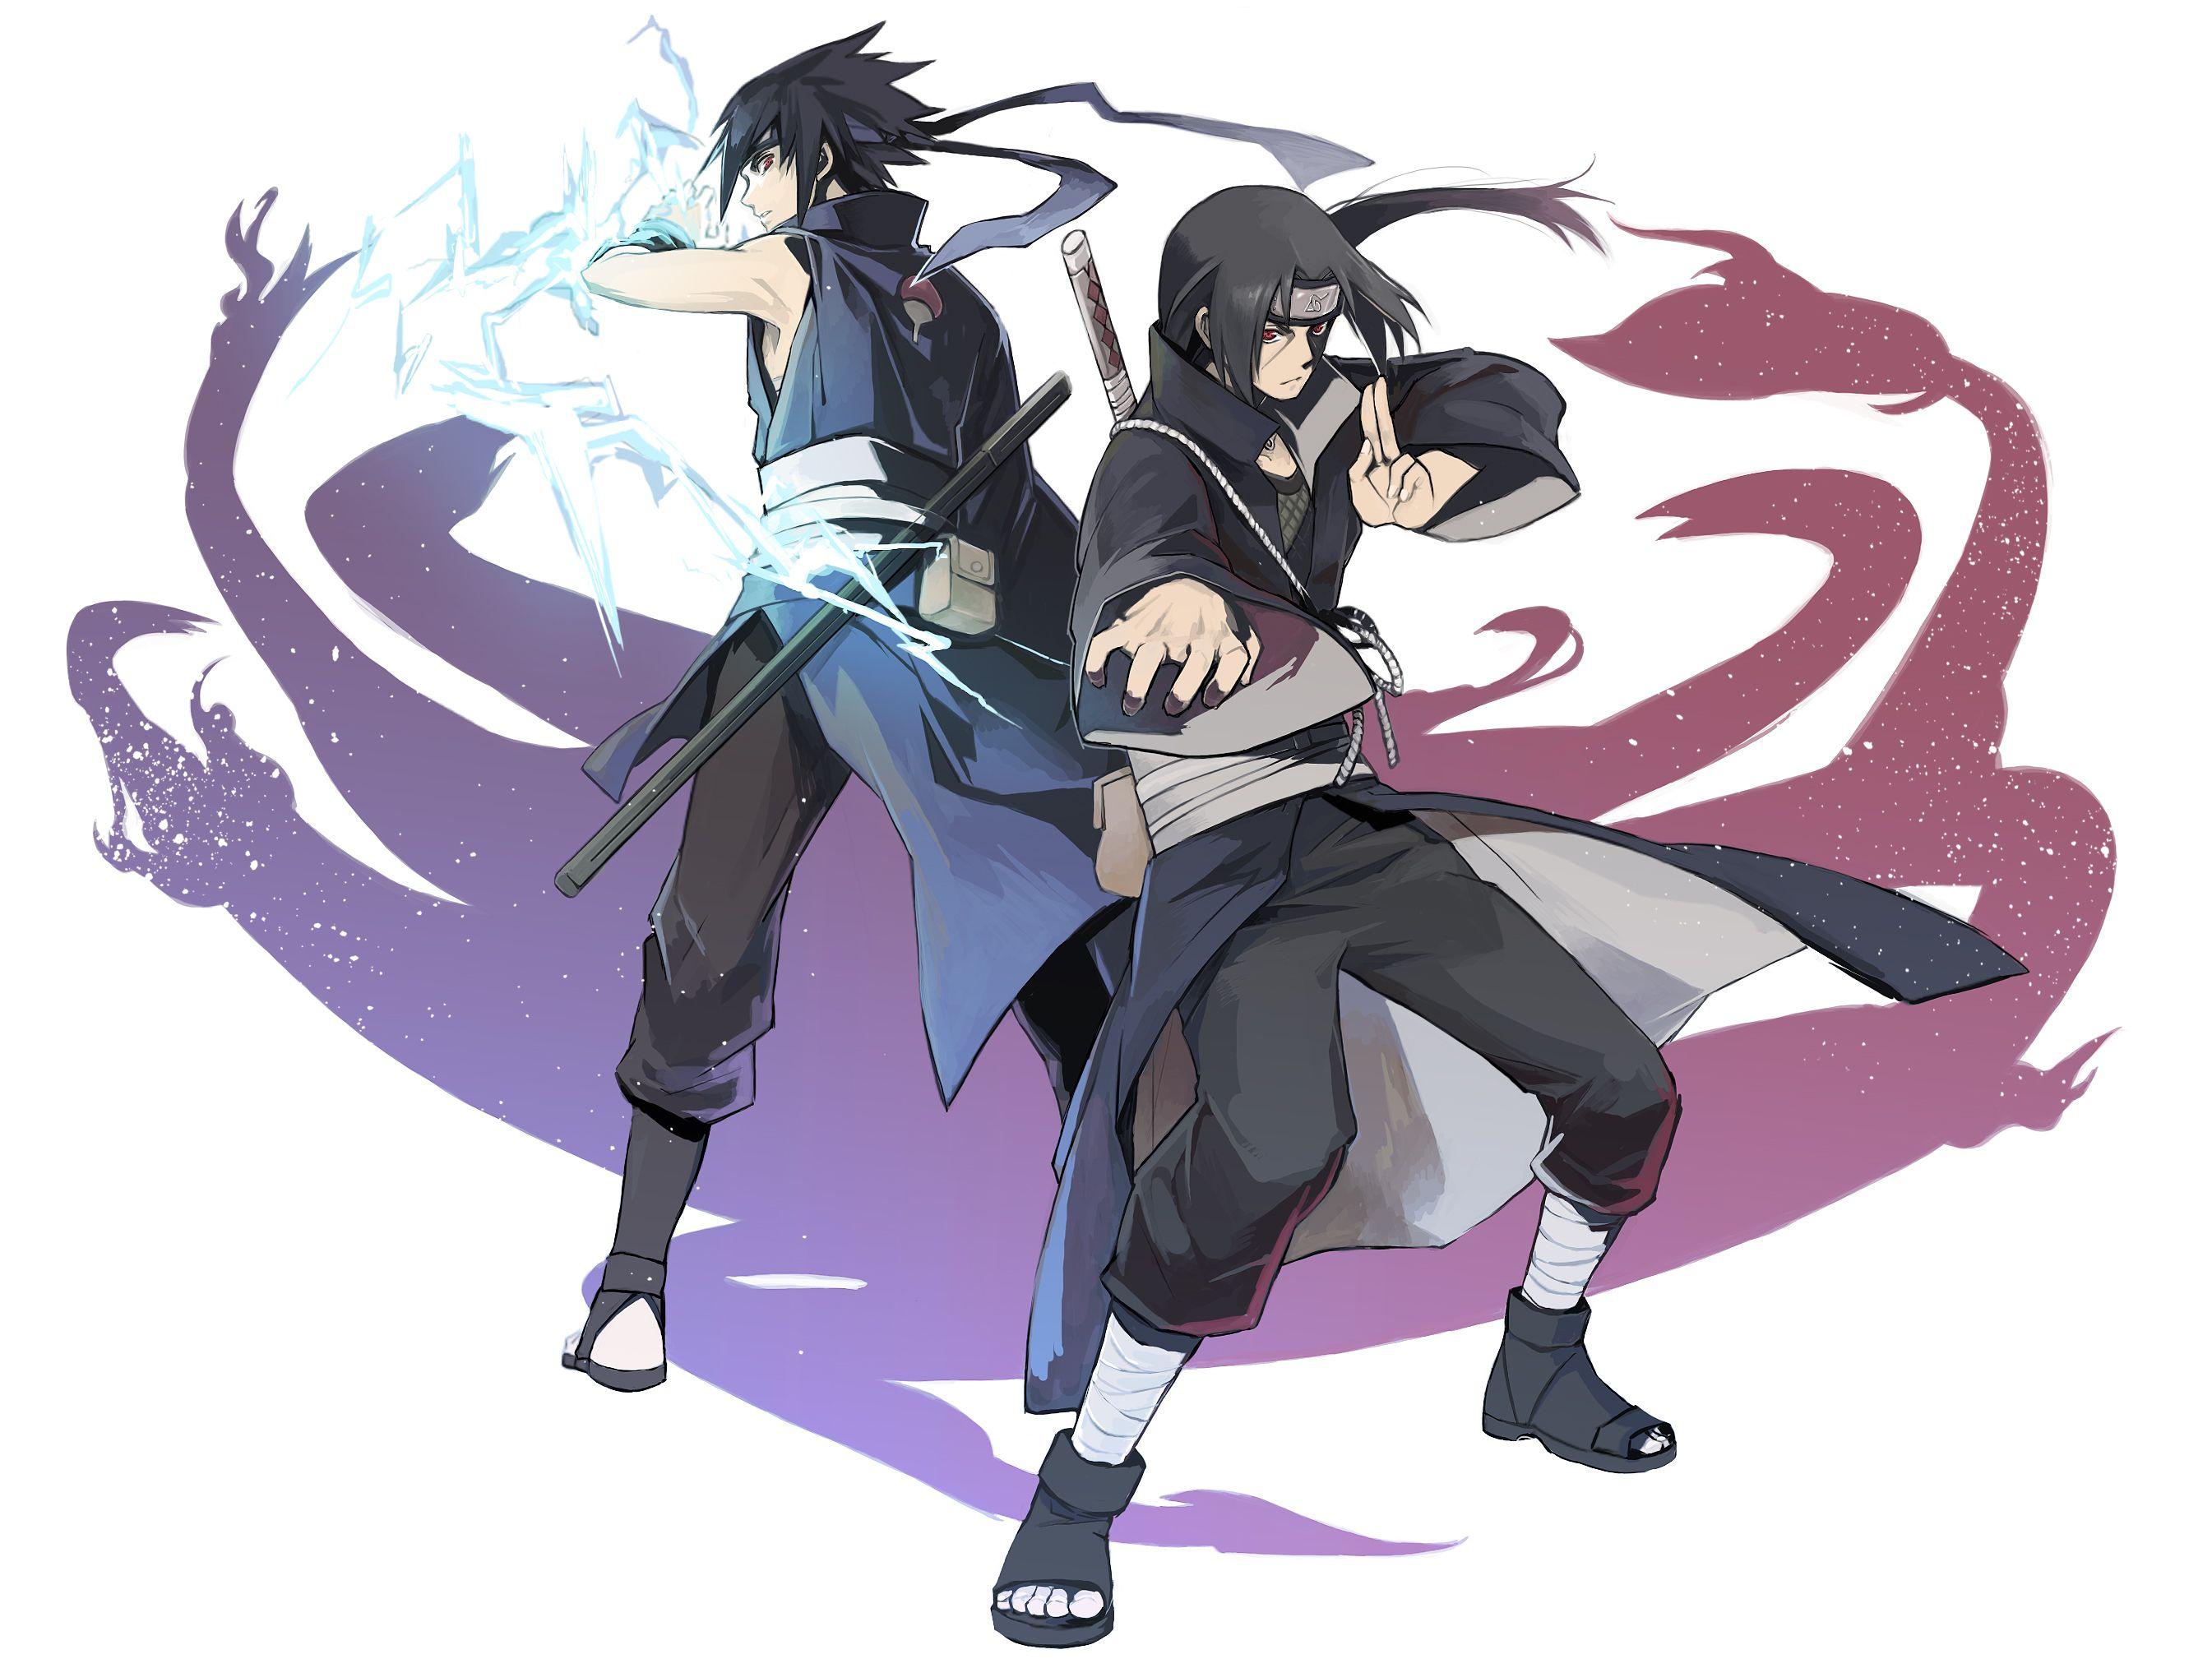 Anime Naruto Sasuke Uchiha Itachi Uchiha Wallpaper Itachi